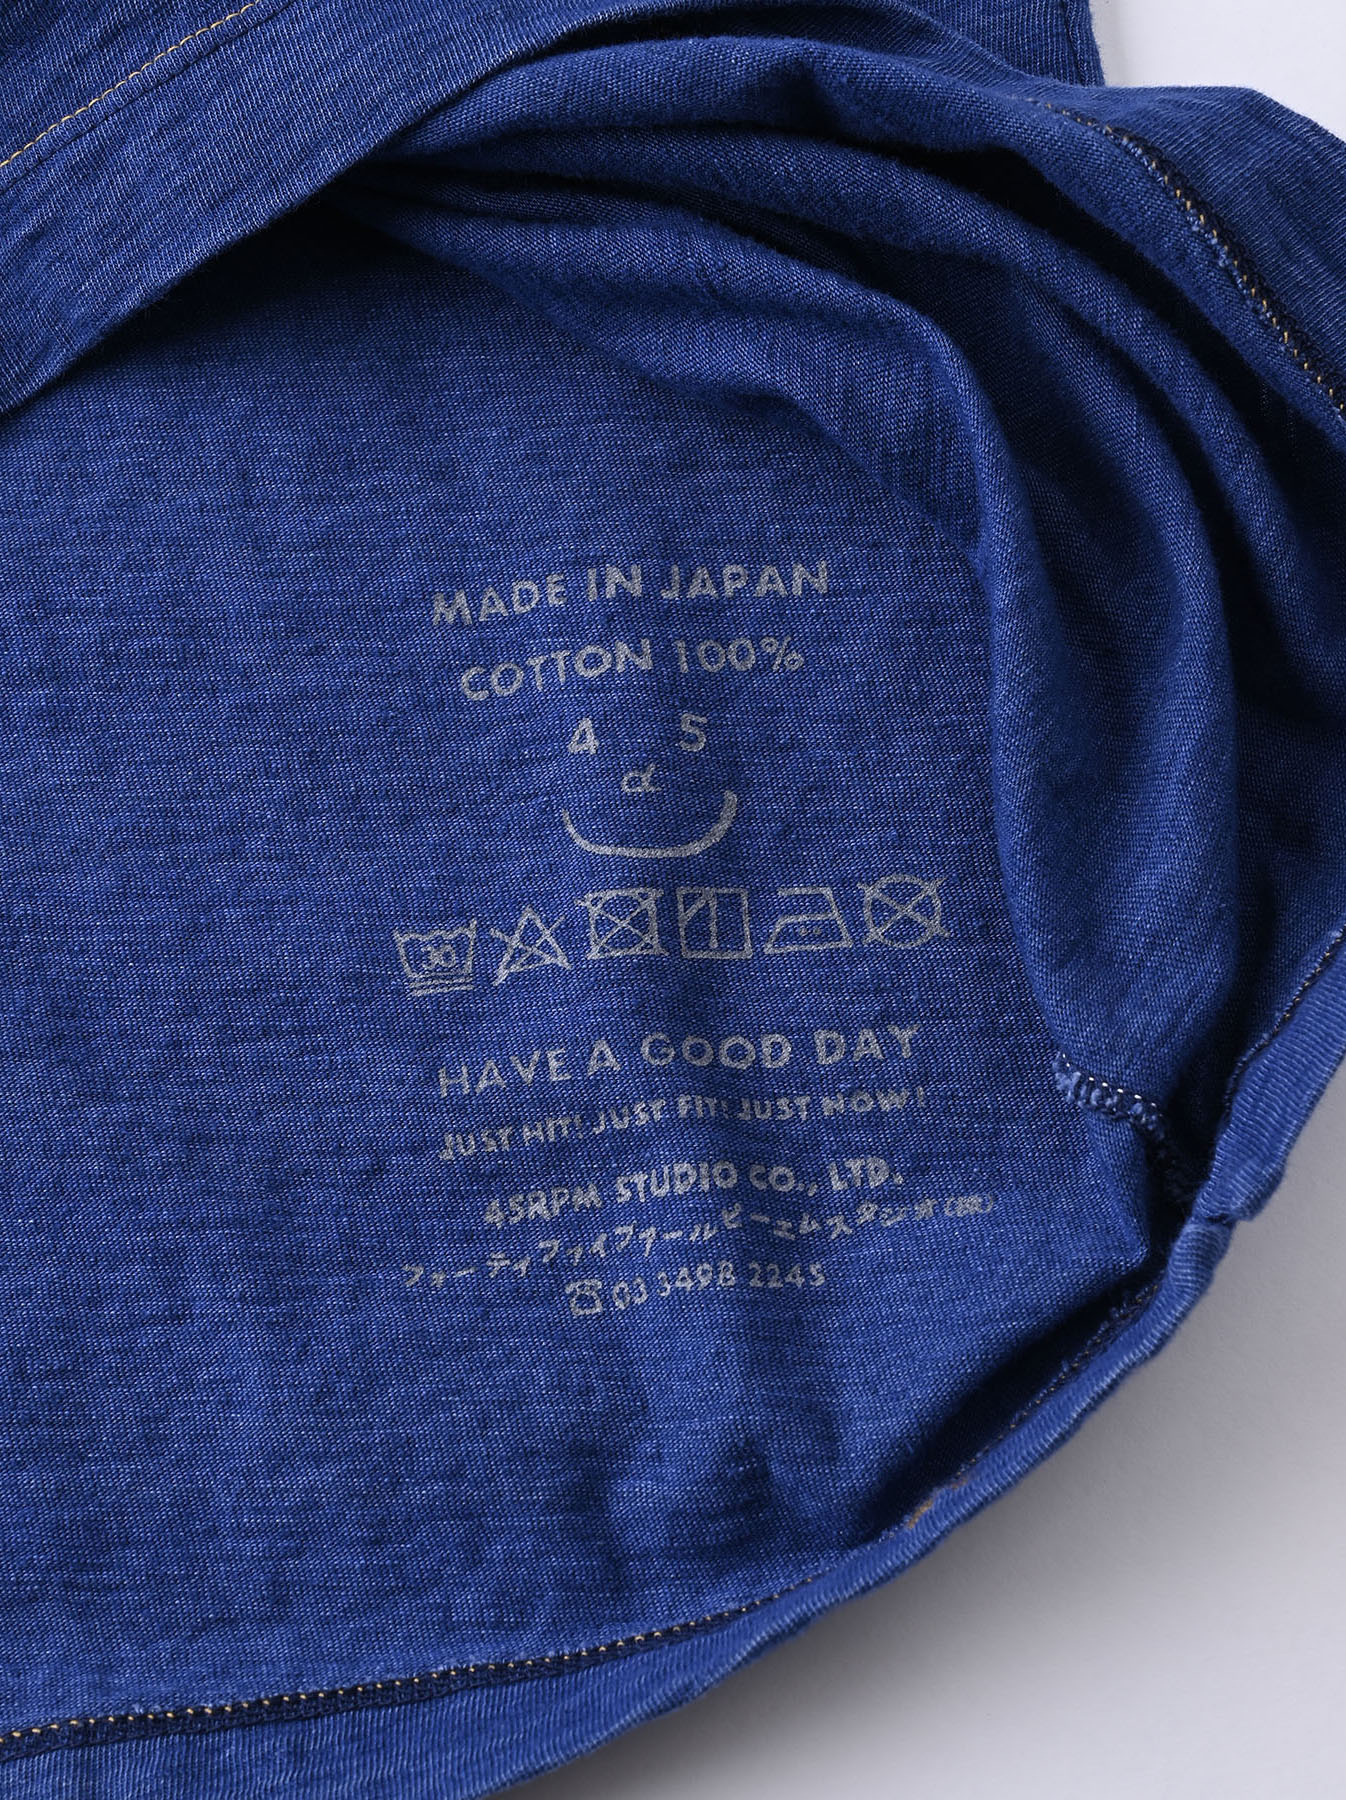 Distressed Indigo Ukiyo de Surf 908 Ocean T-shirt (0621)-8